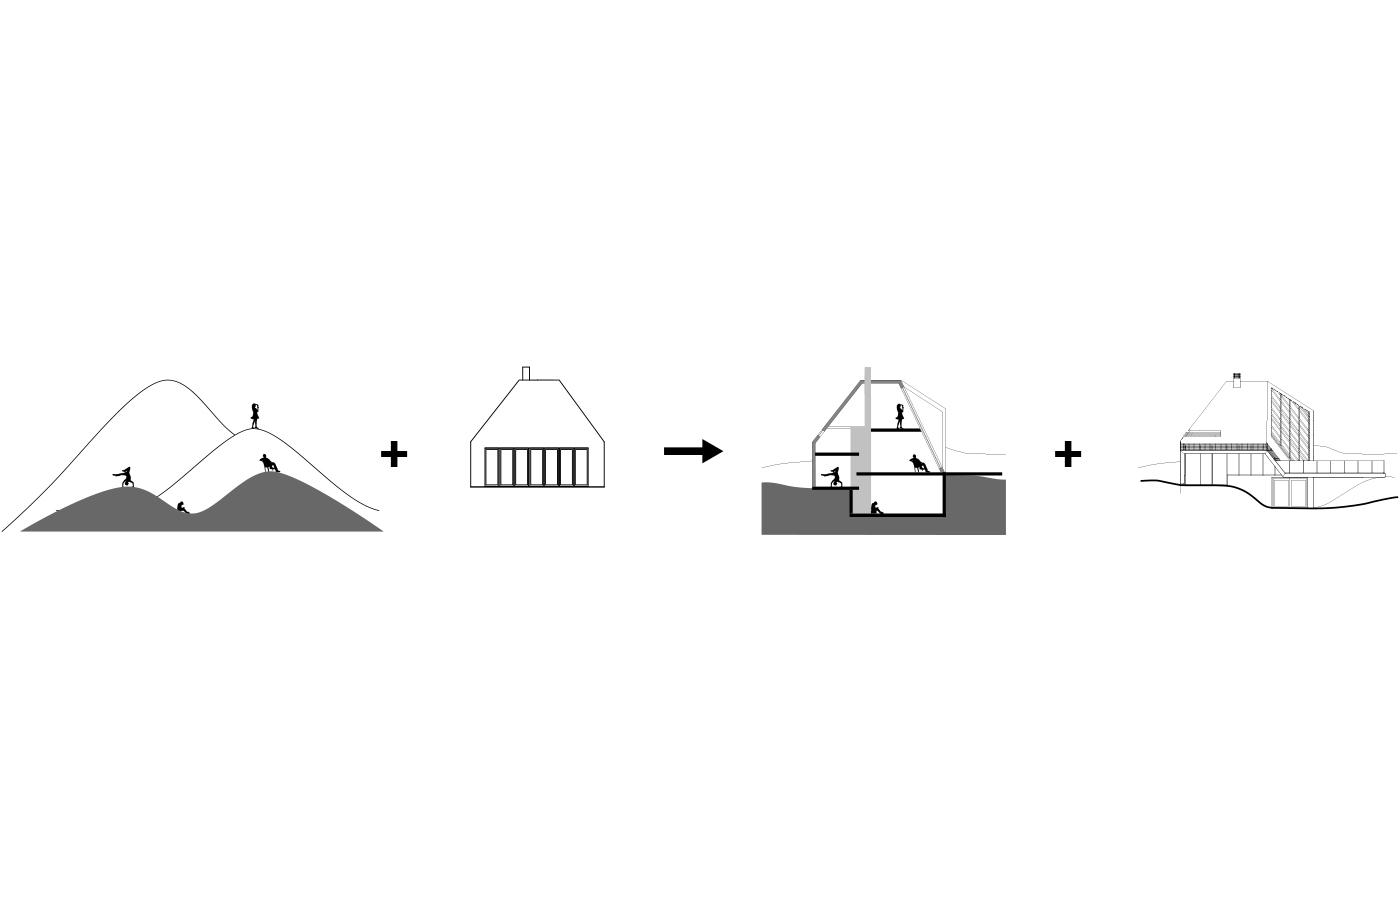 schemes-dune-house.jpg